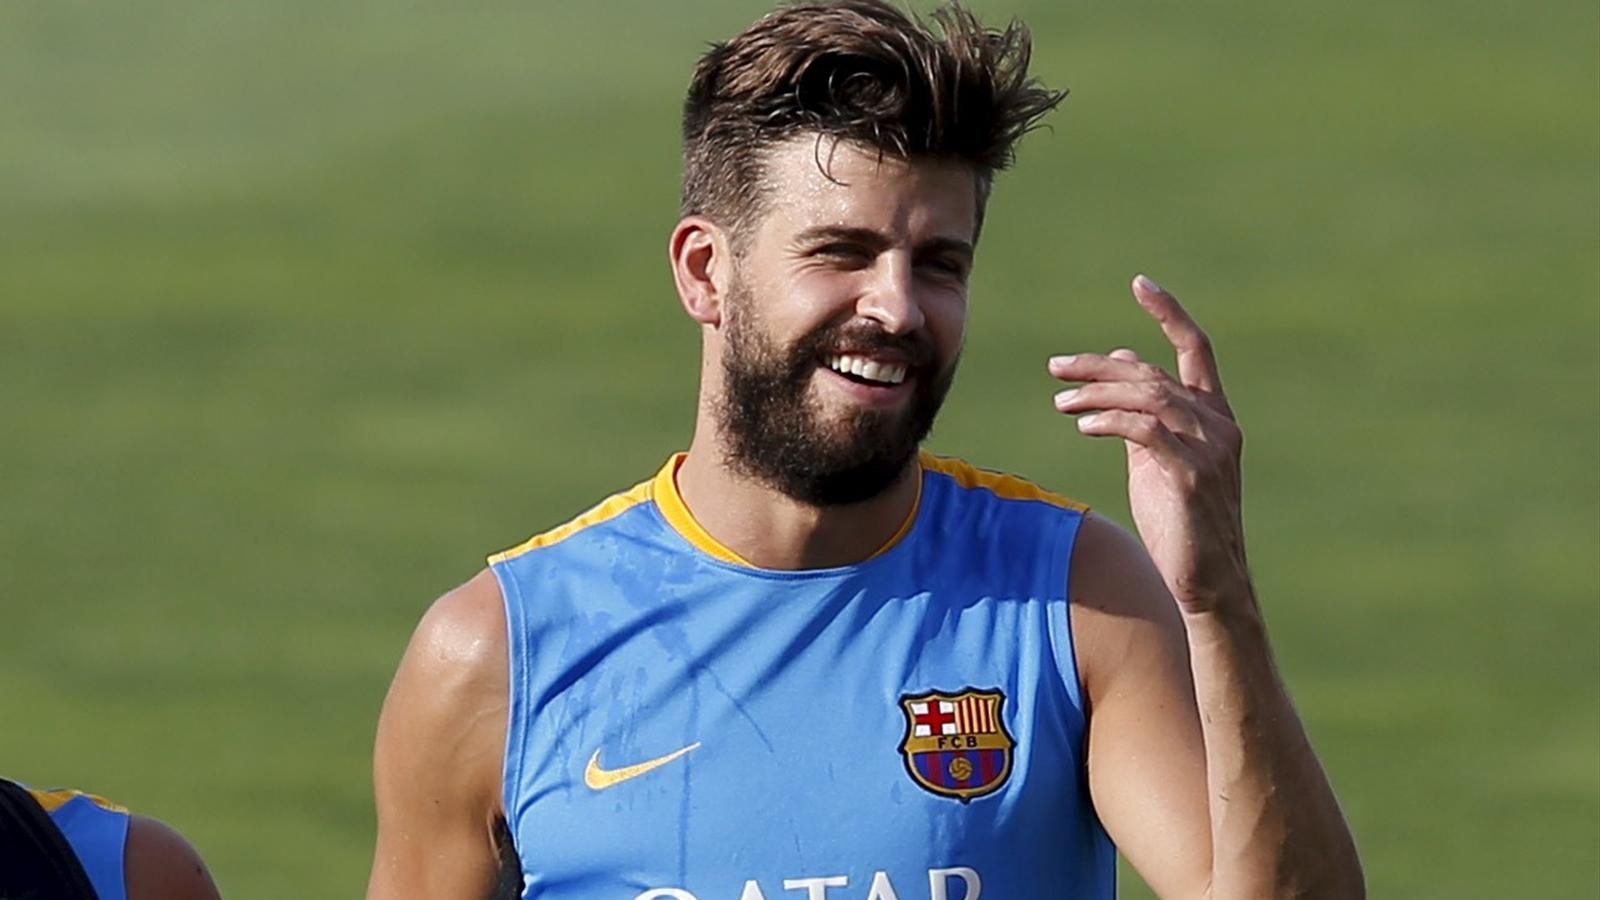 Barcelona defender Gerard Pique laughs during training